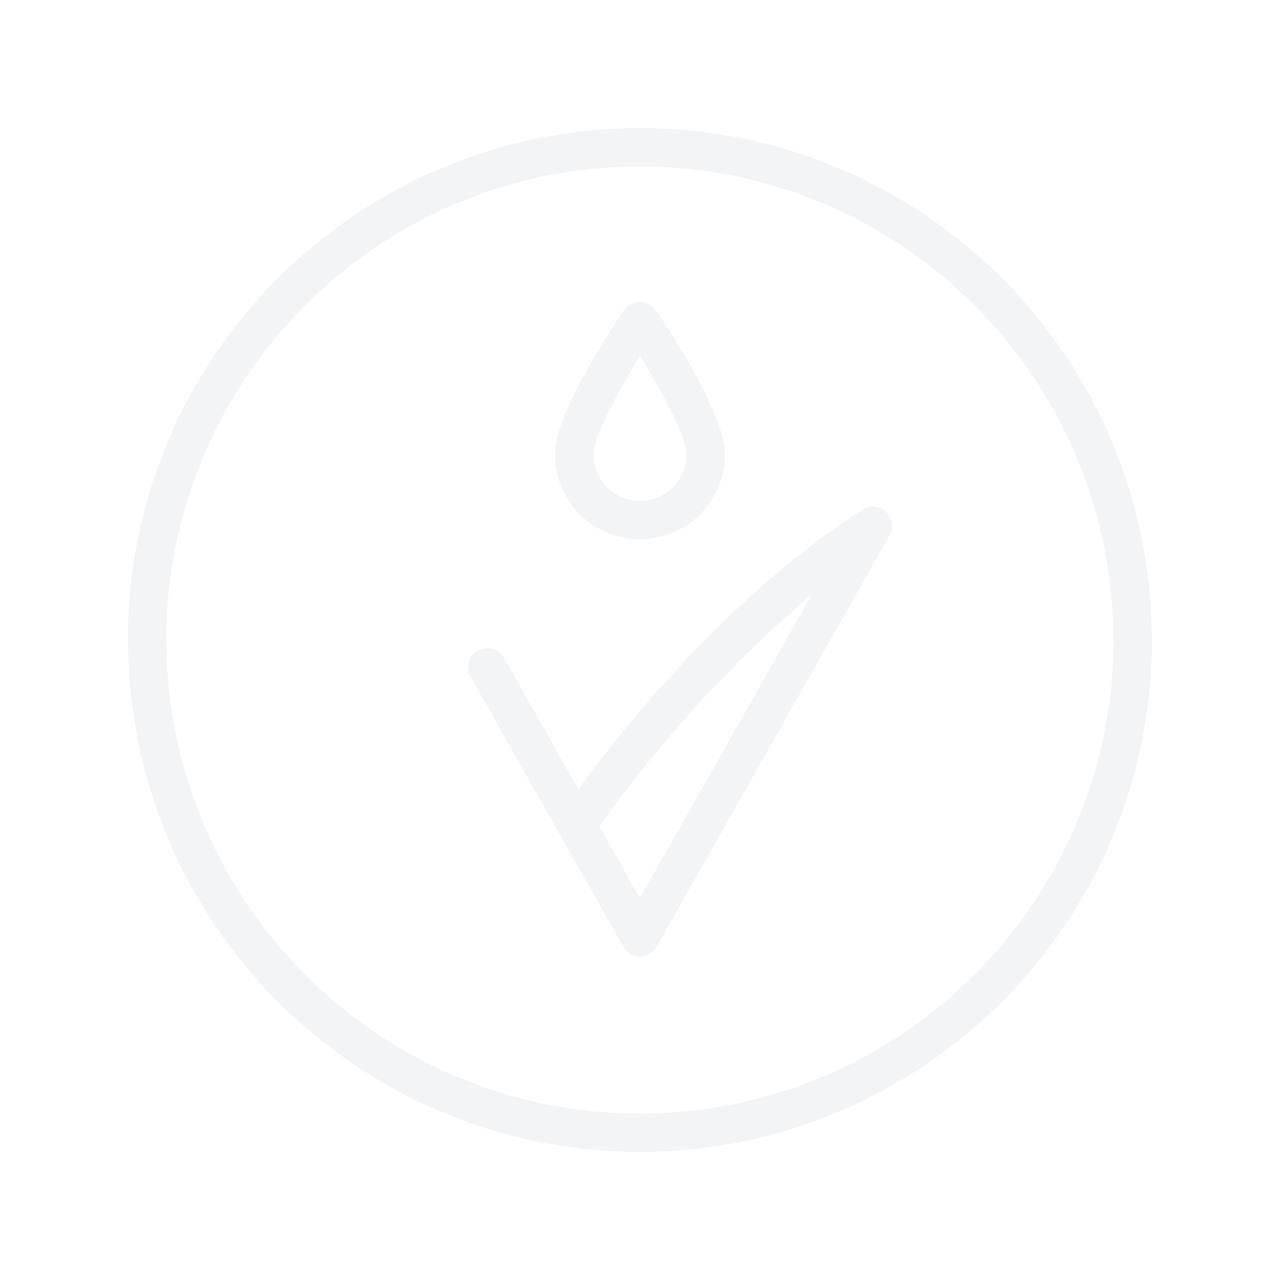 ELIZABETH ARDEN Ceramide Cream Blush No.3 Honey 2.67g